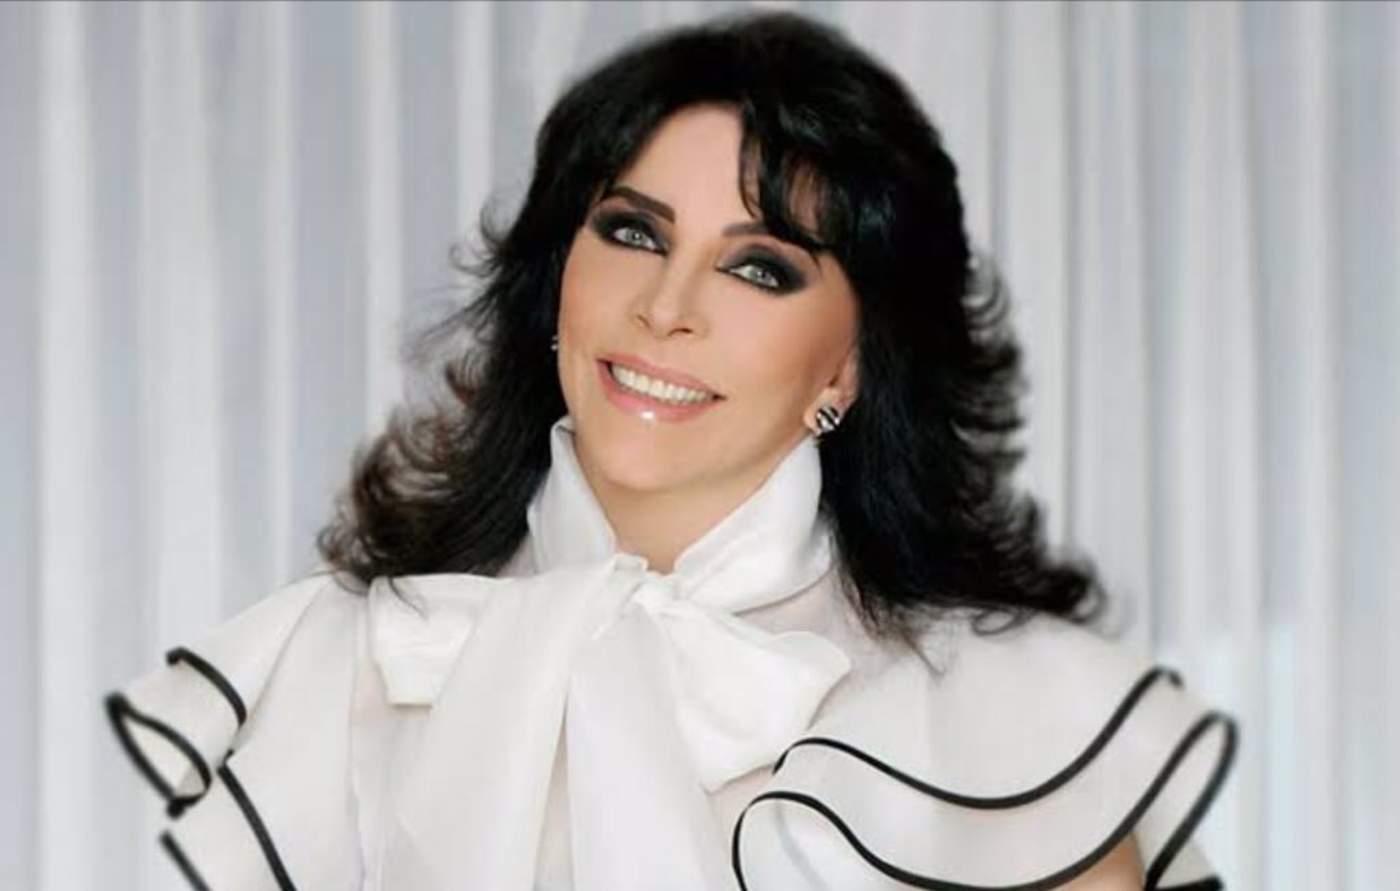 Verónica Castro anuncia retiro tras polémica con Yolanda Andrade